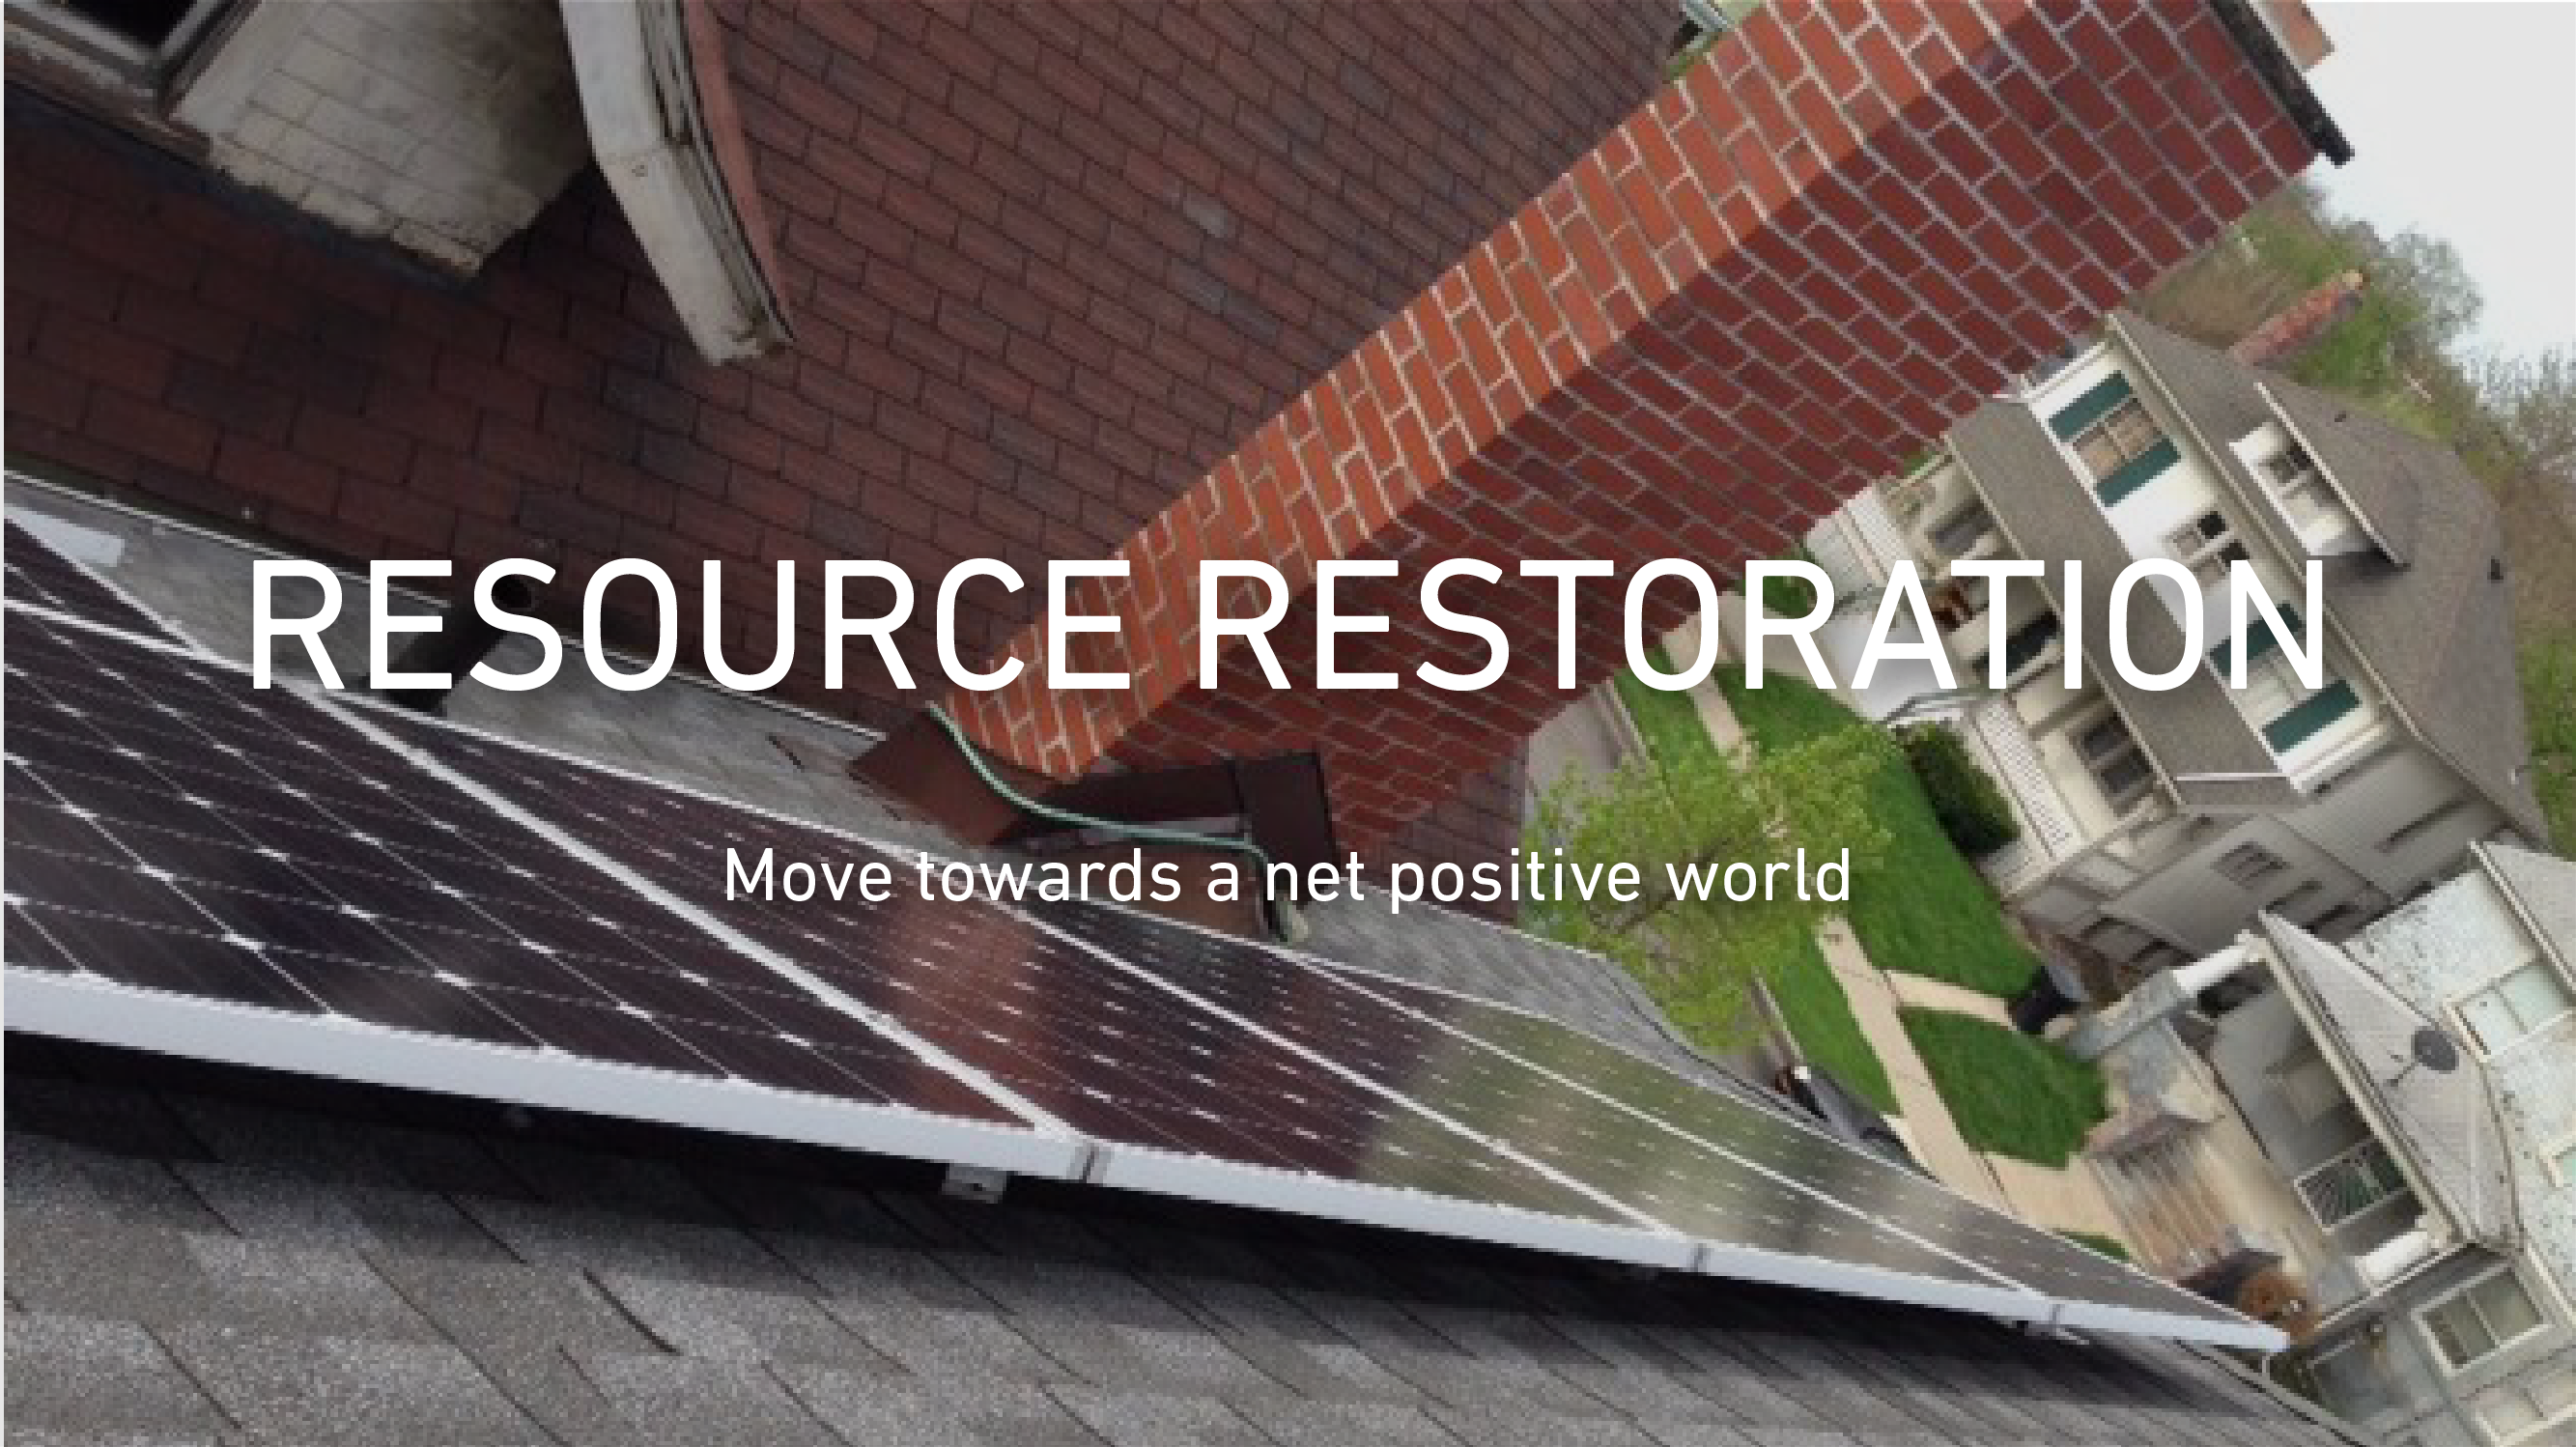 Resource-03